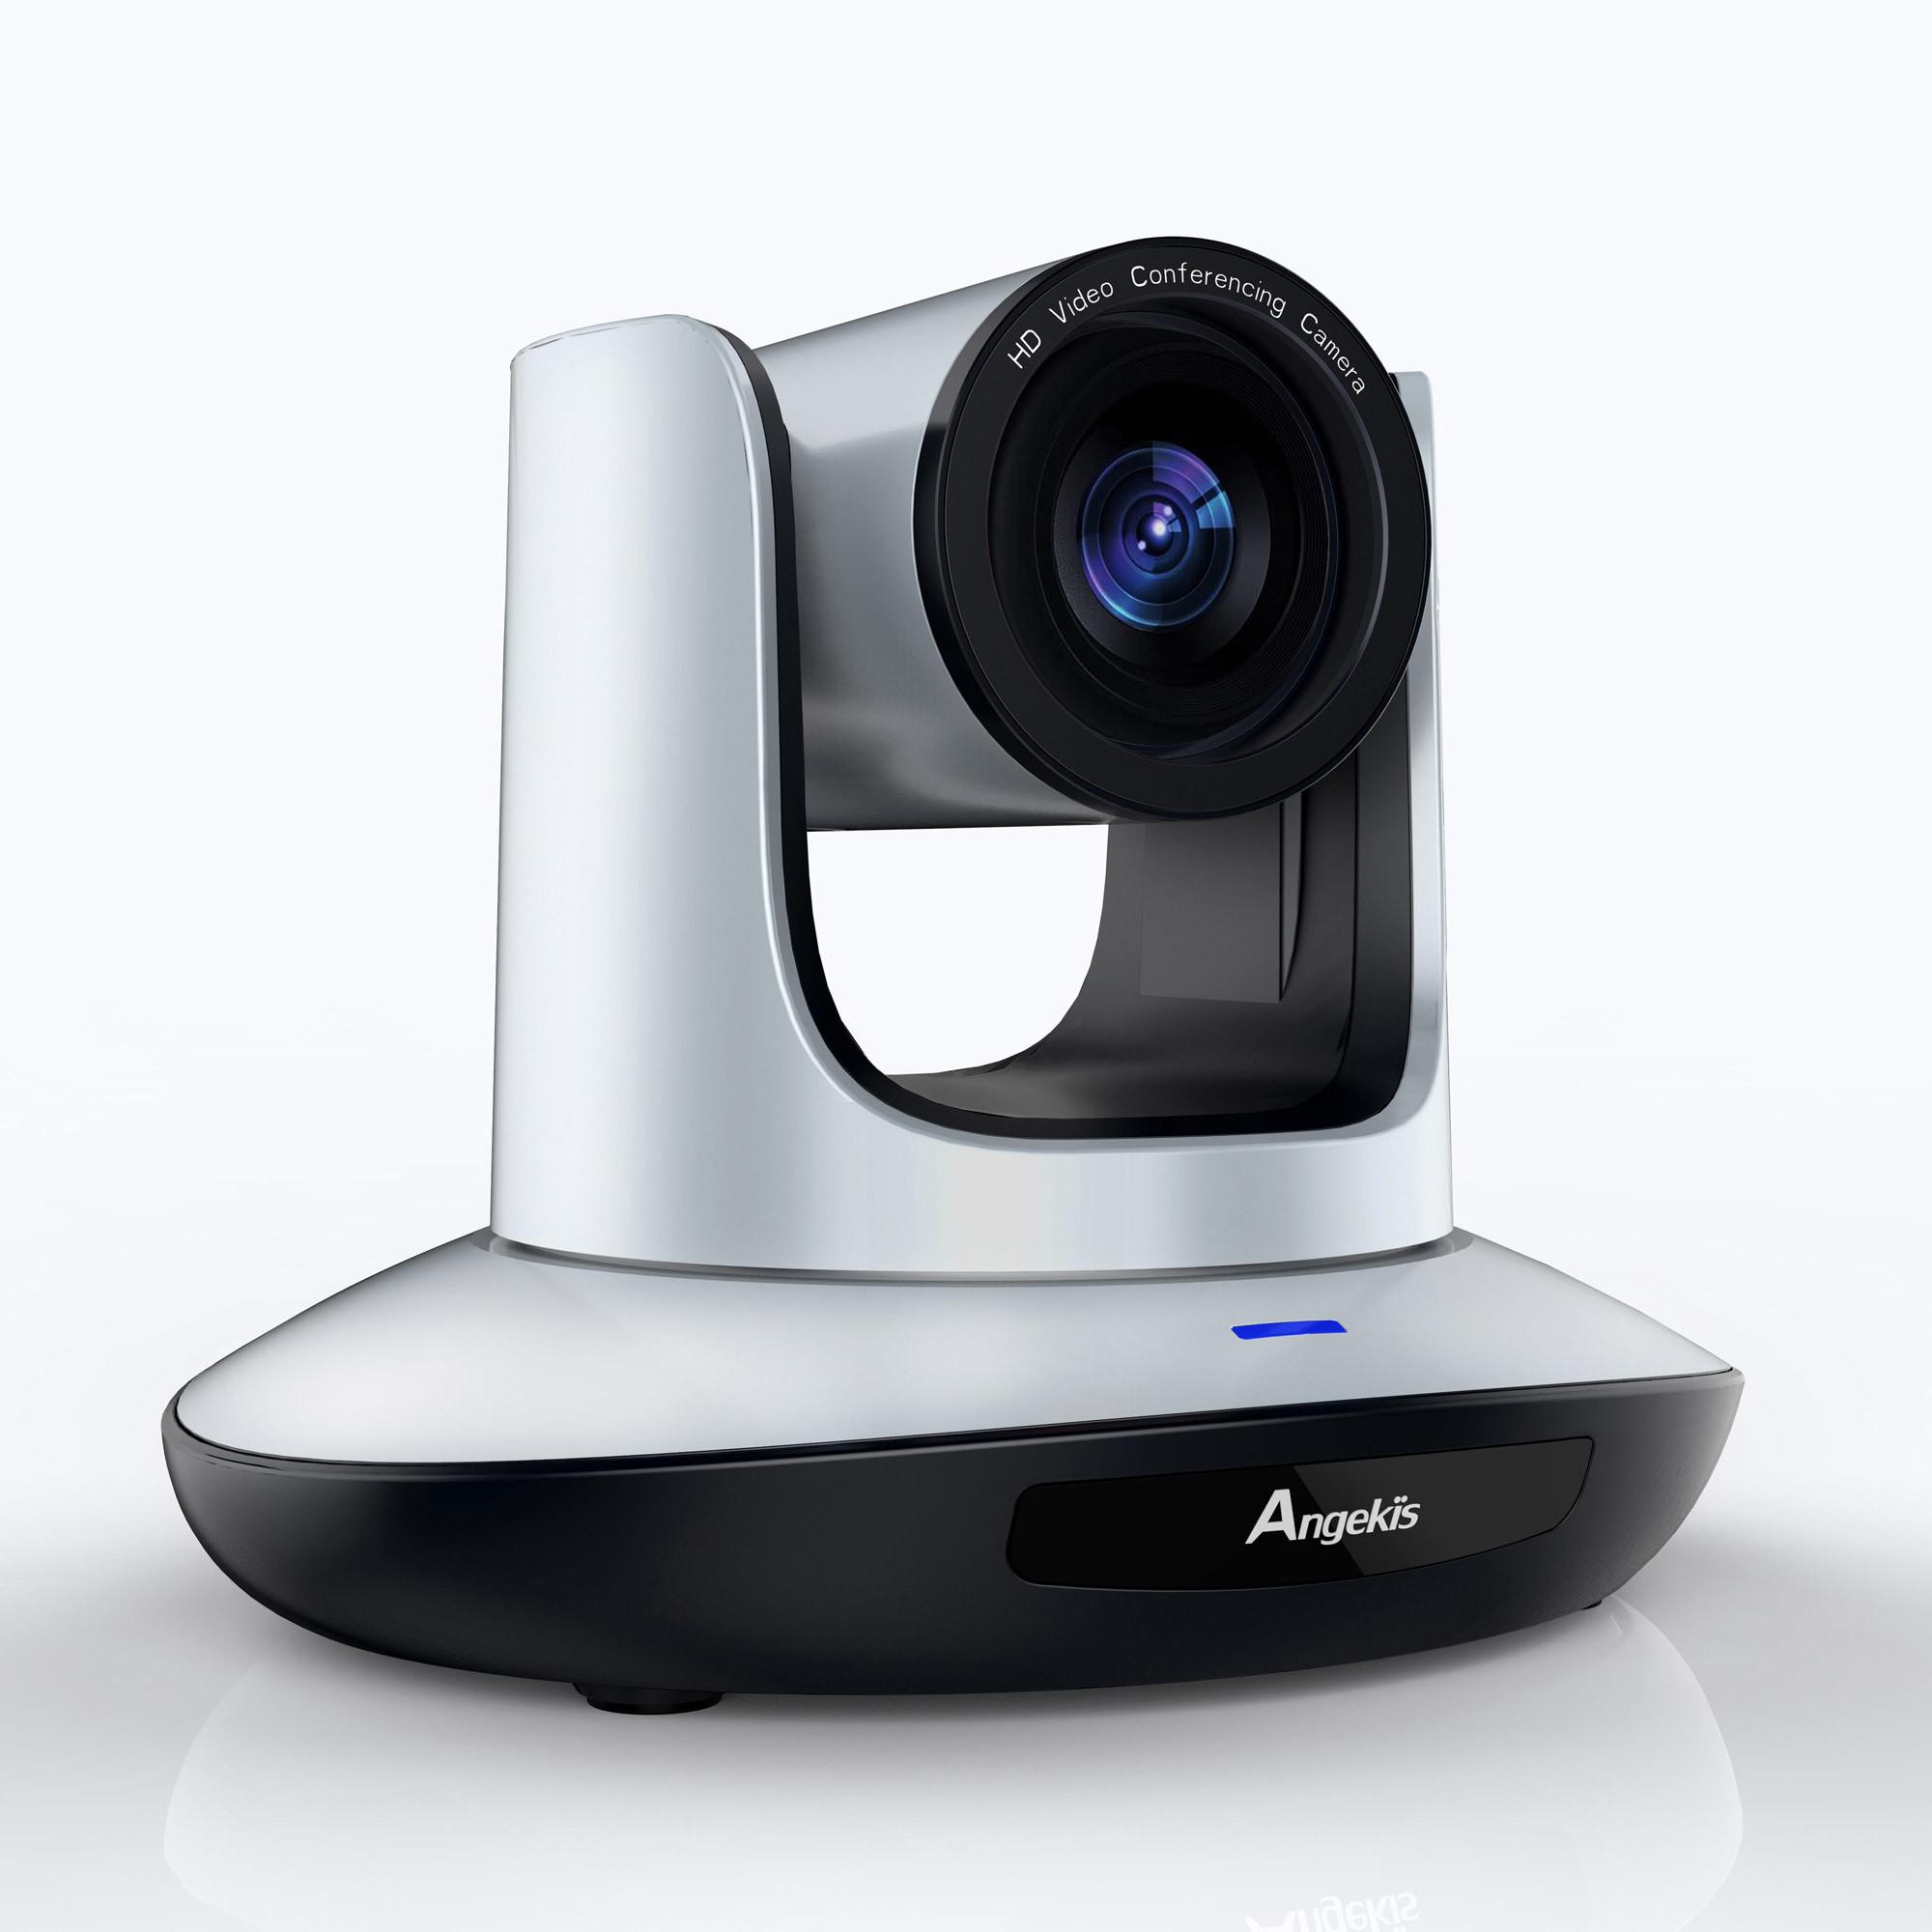 USB3.0 1080P 60 12X Video HD Conference PTZ Camera (U3D-12FHD60)